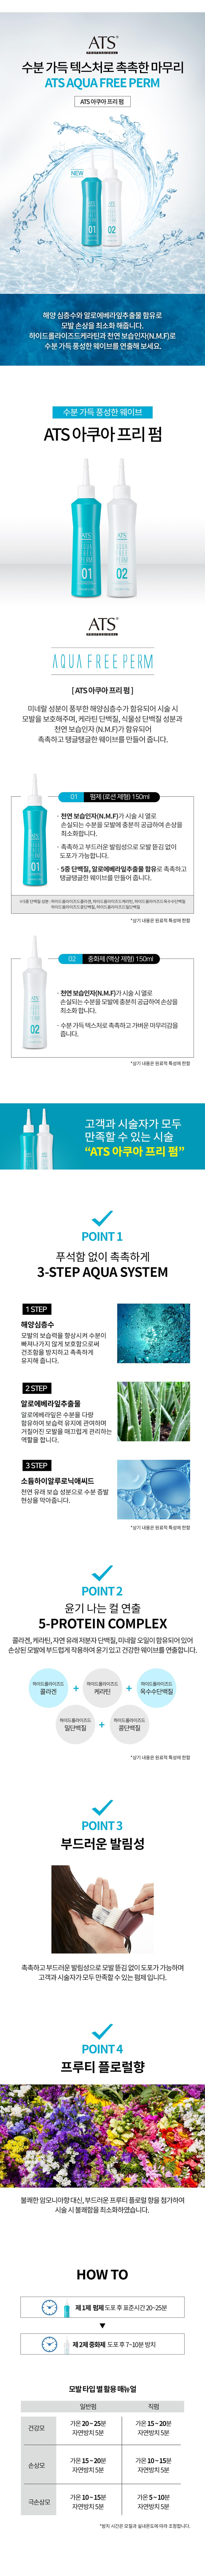 aquafreeperm.jpg